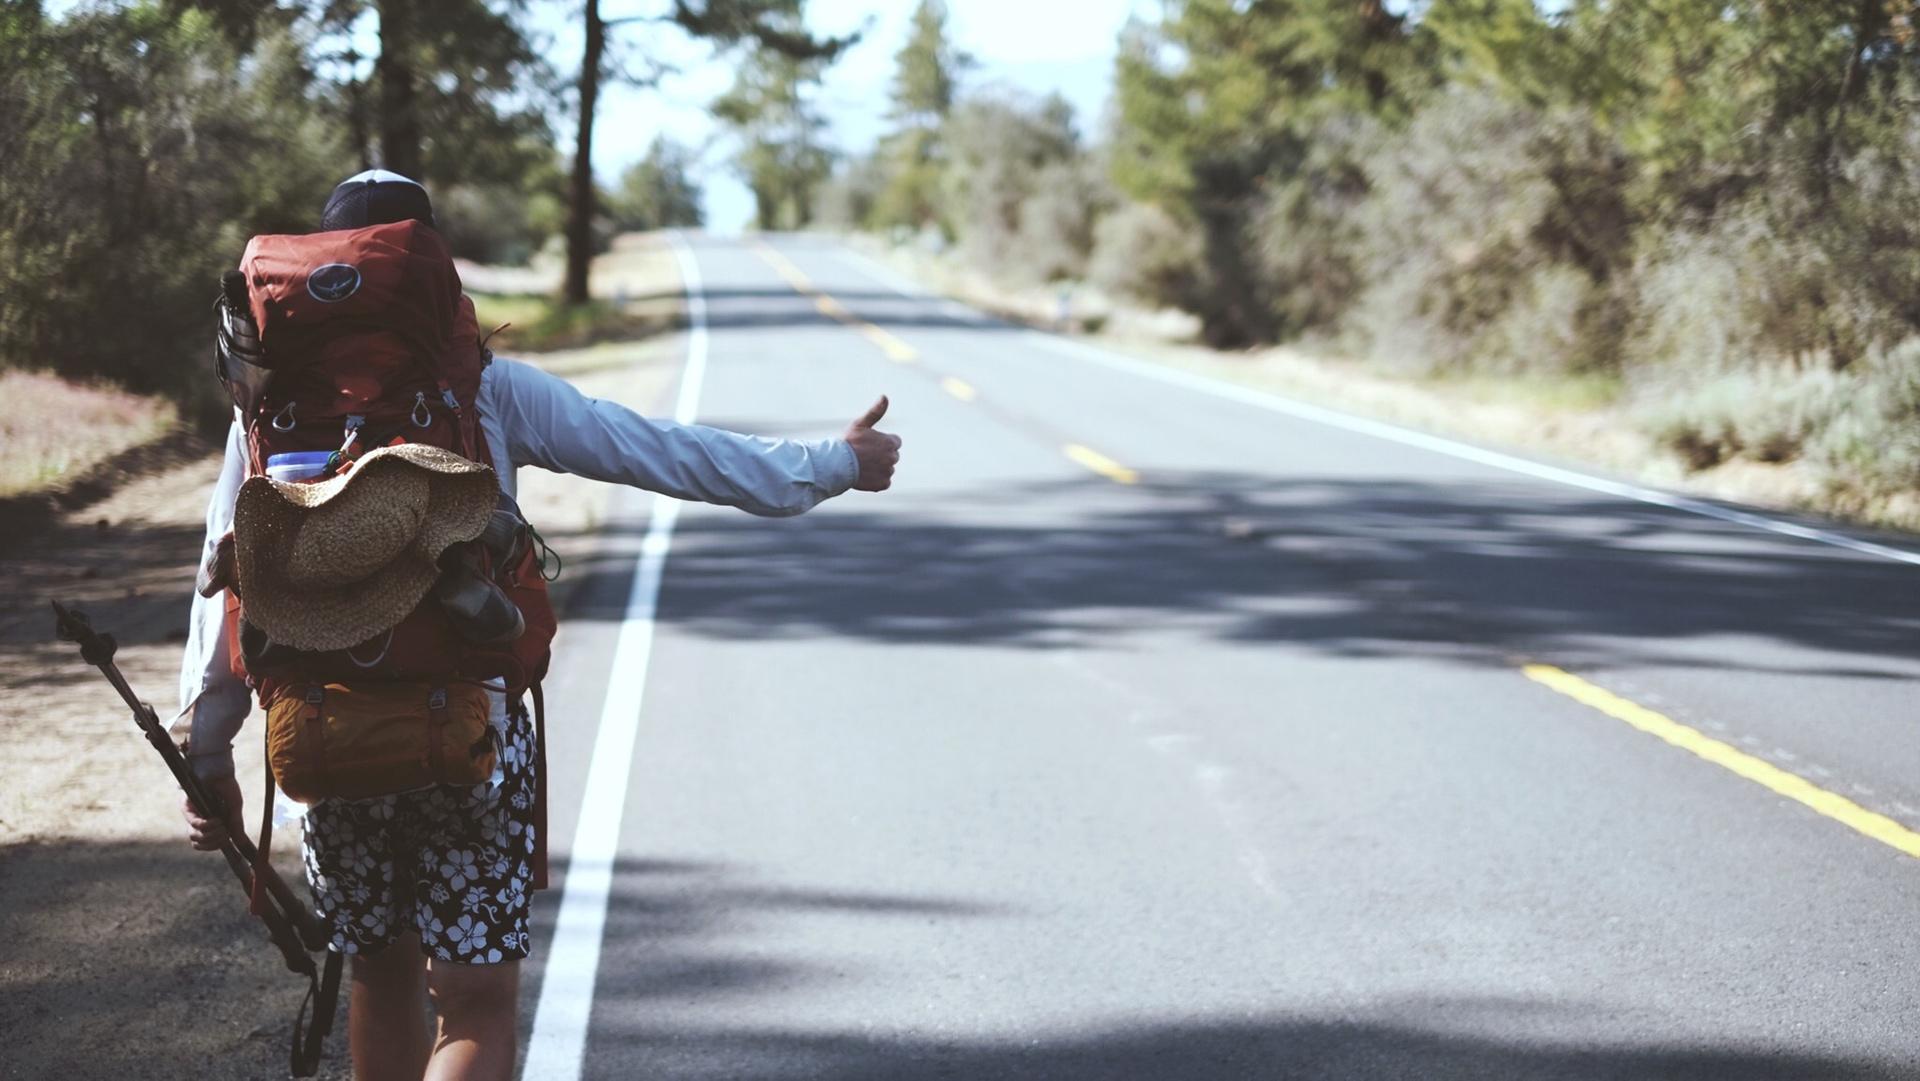 PCT hiker hitchhiking